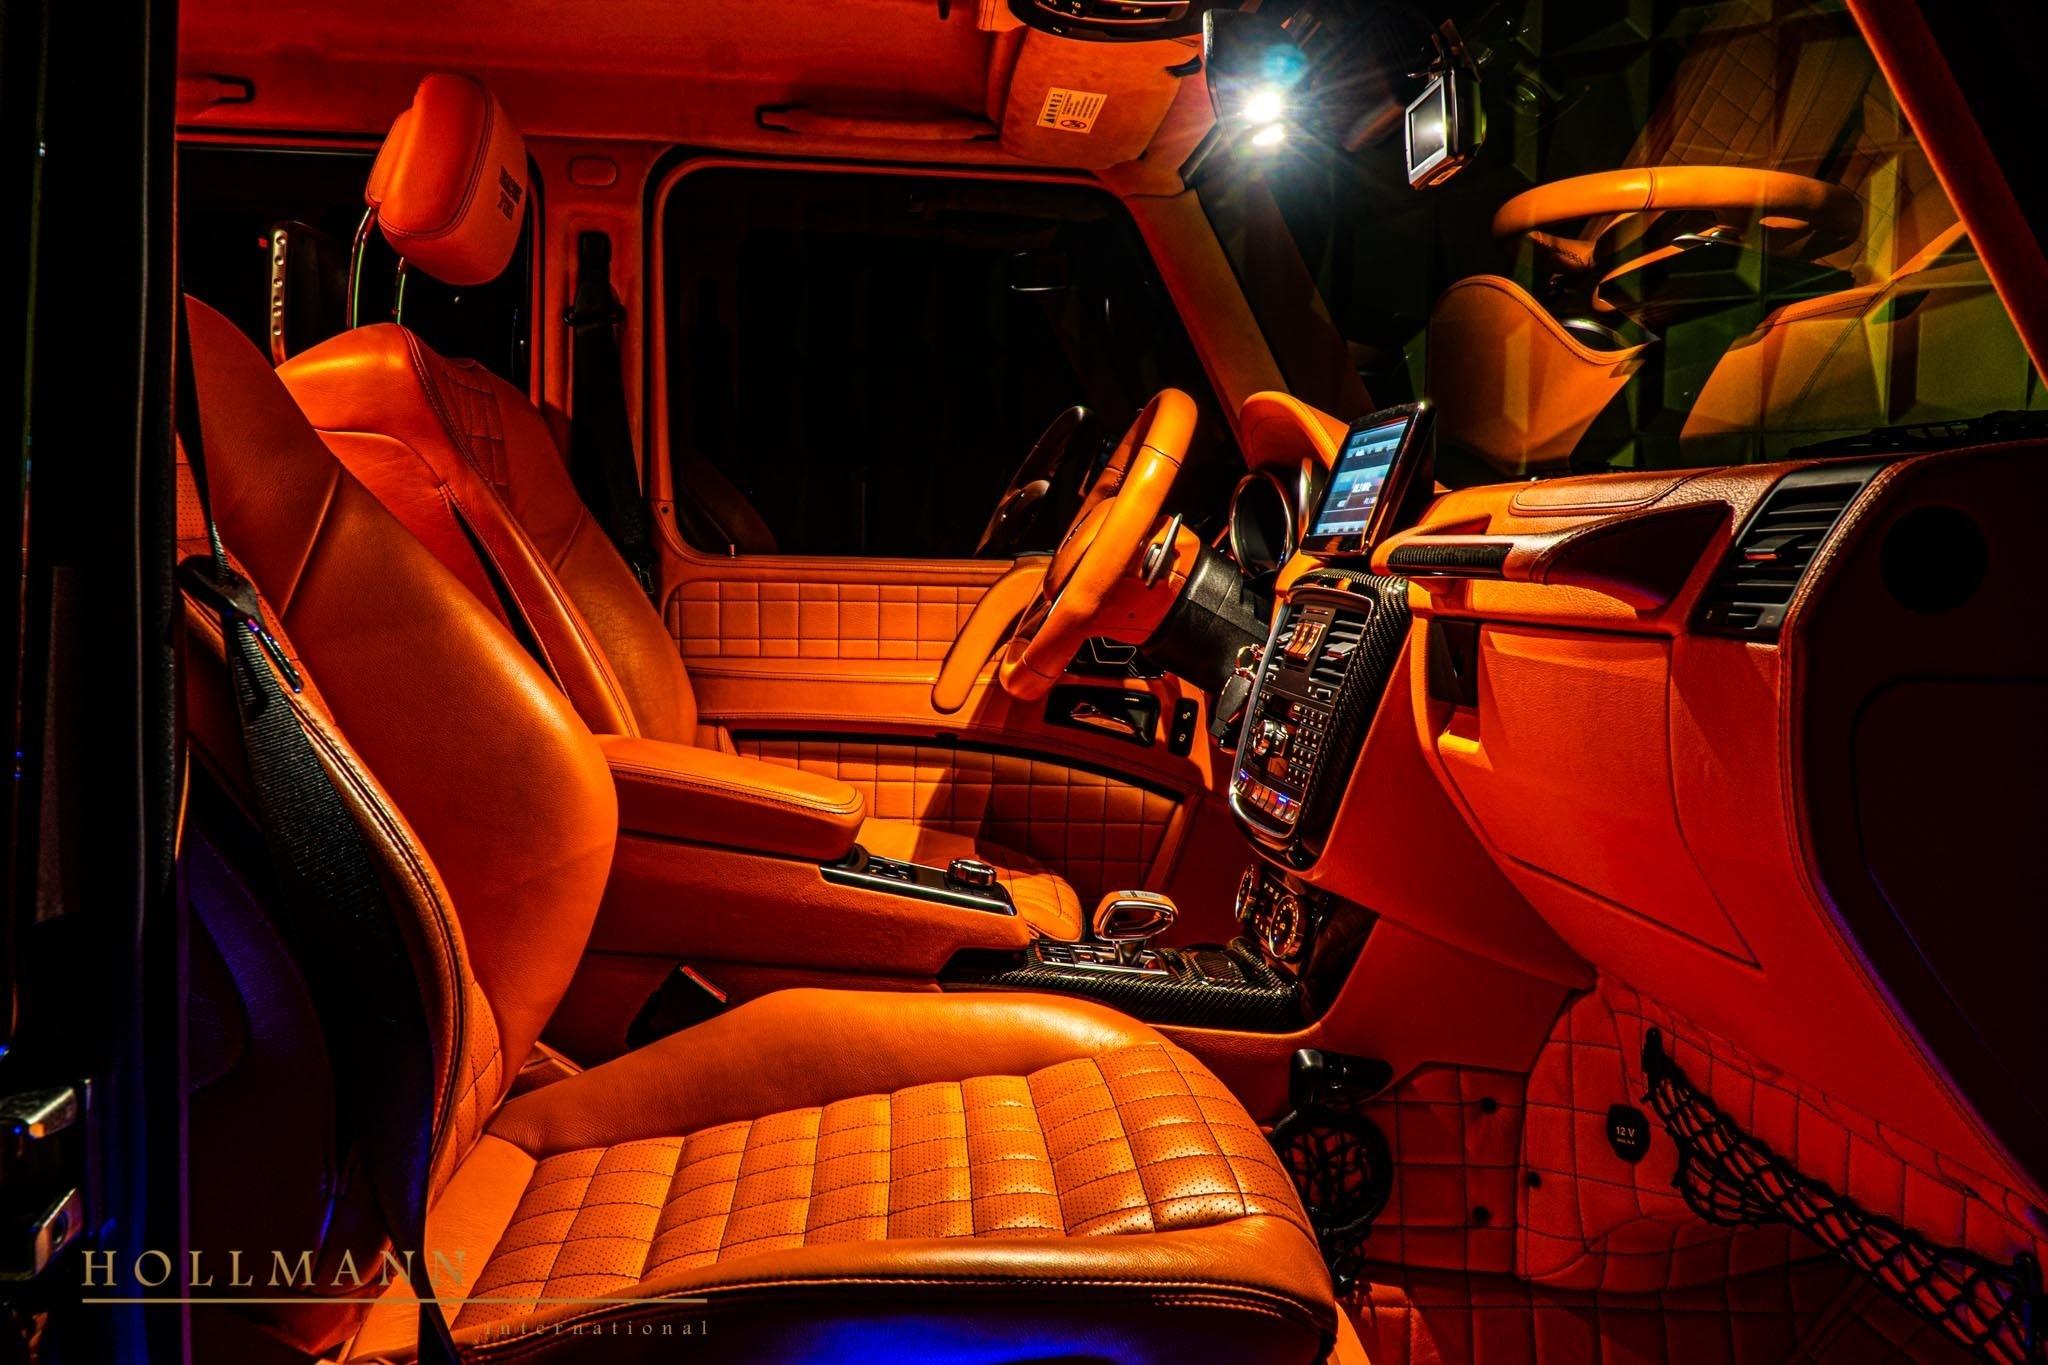 Mercedes-AMG G 63 6x6 Brabus